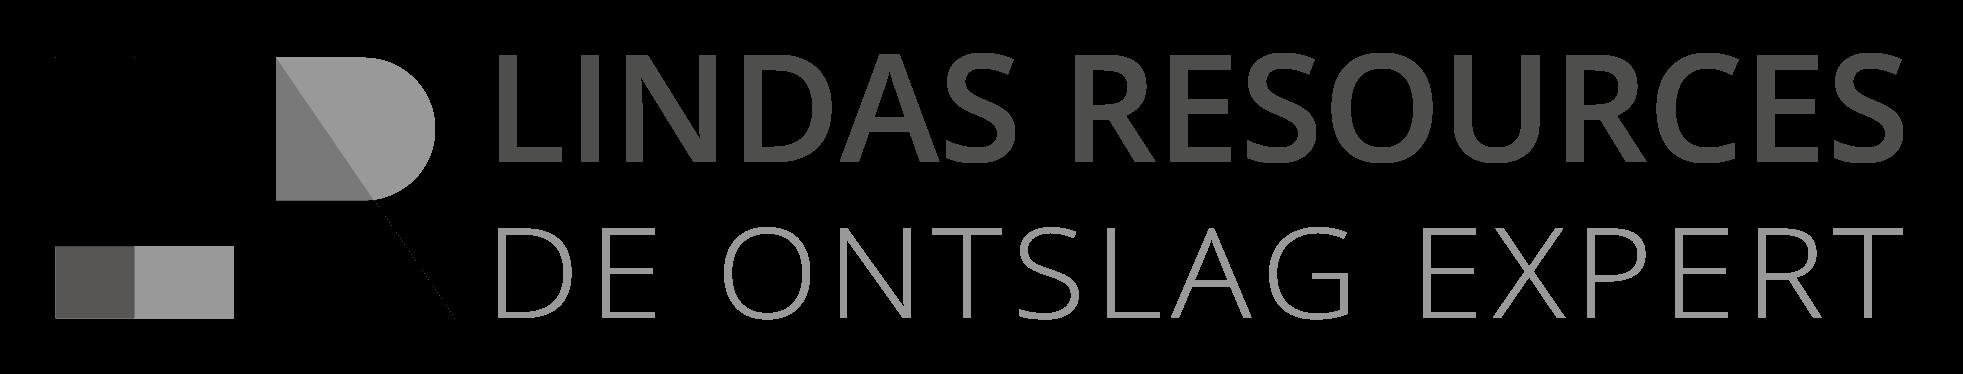 Lindas Resources